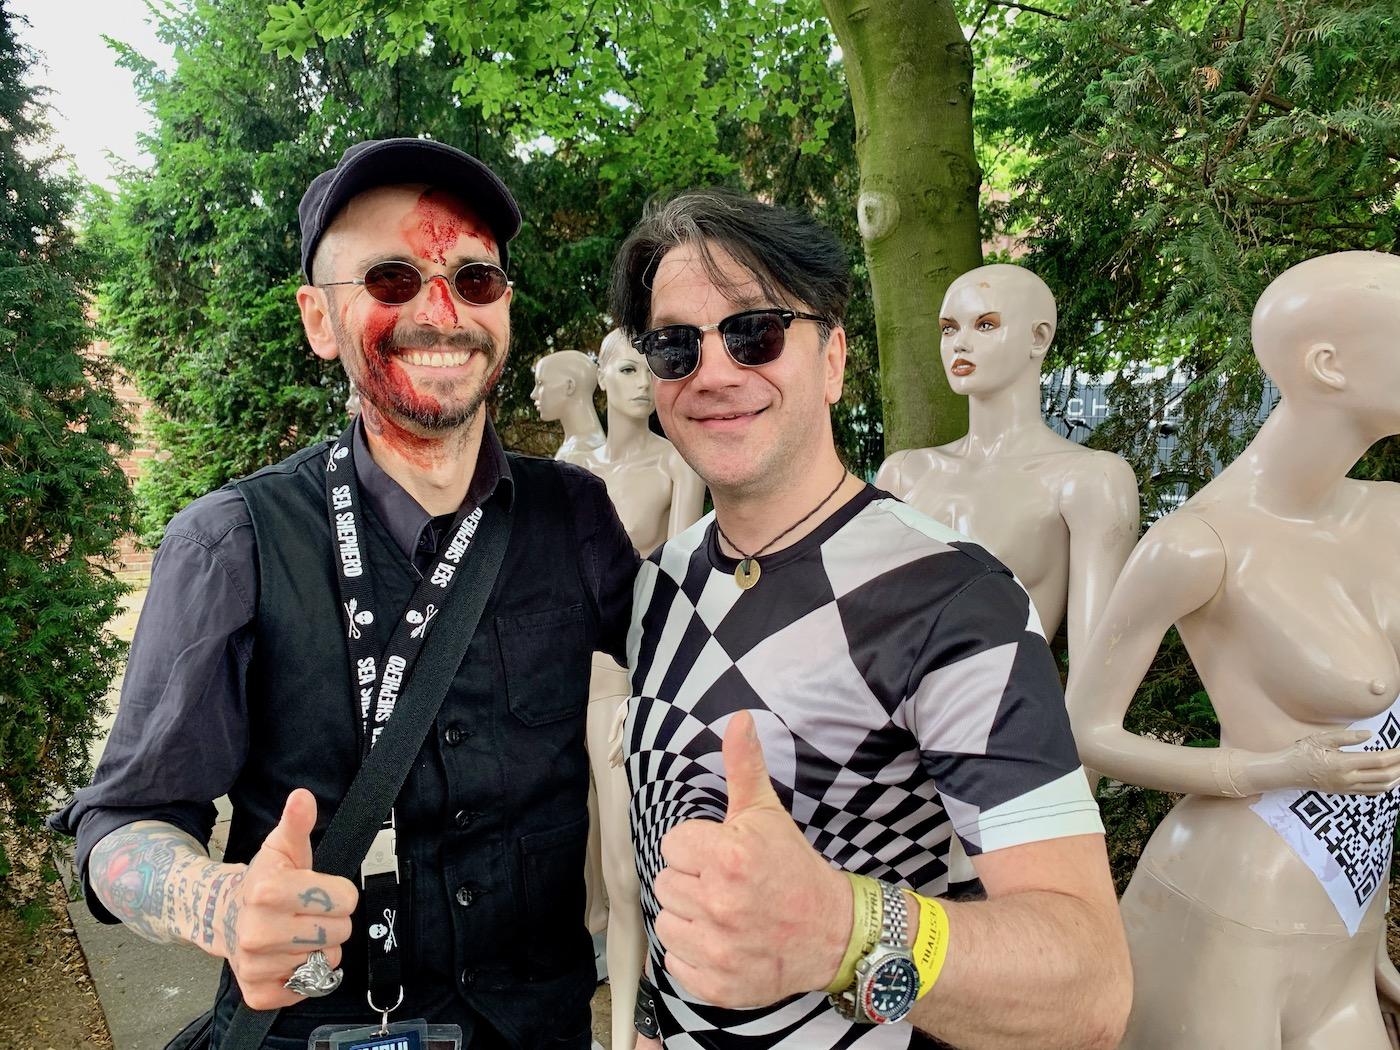 mark_benecke_amphi_festival_koeln_2019 - 165.jpg